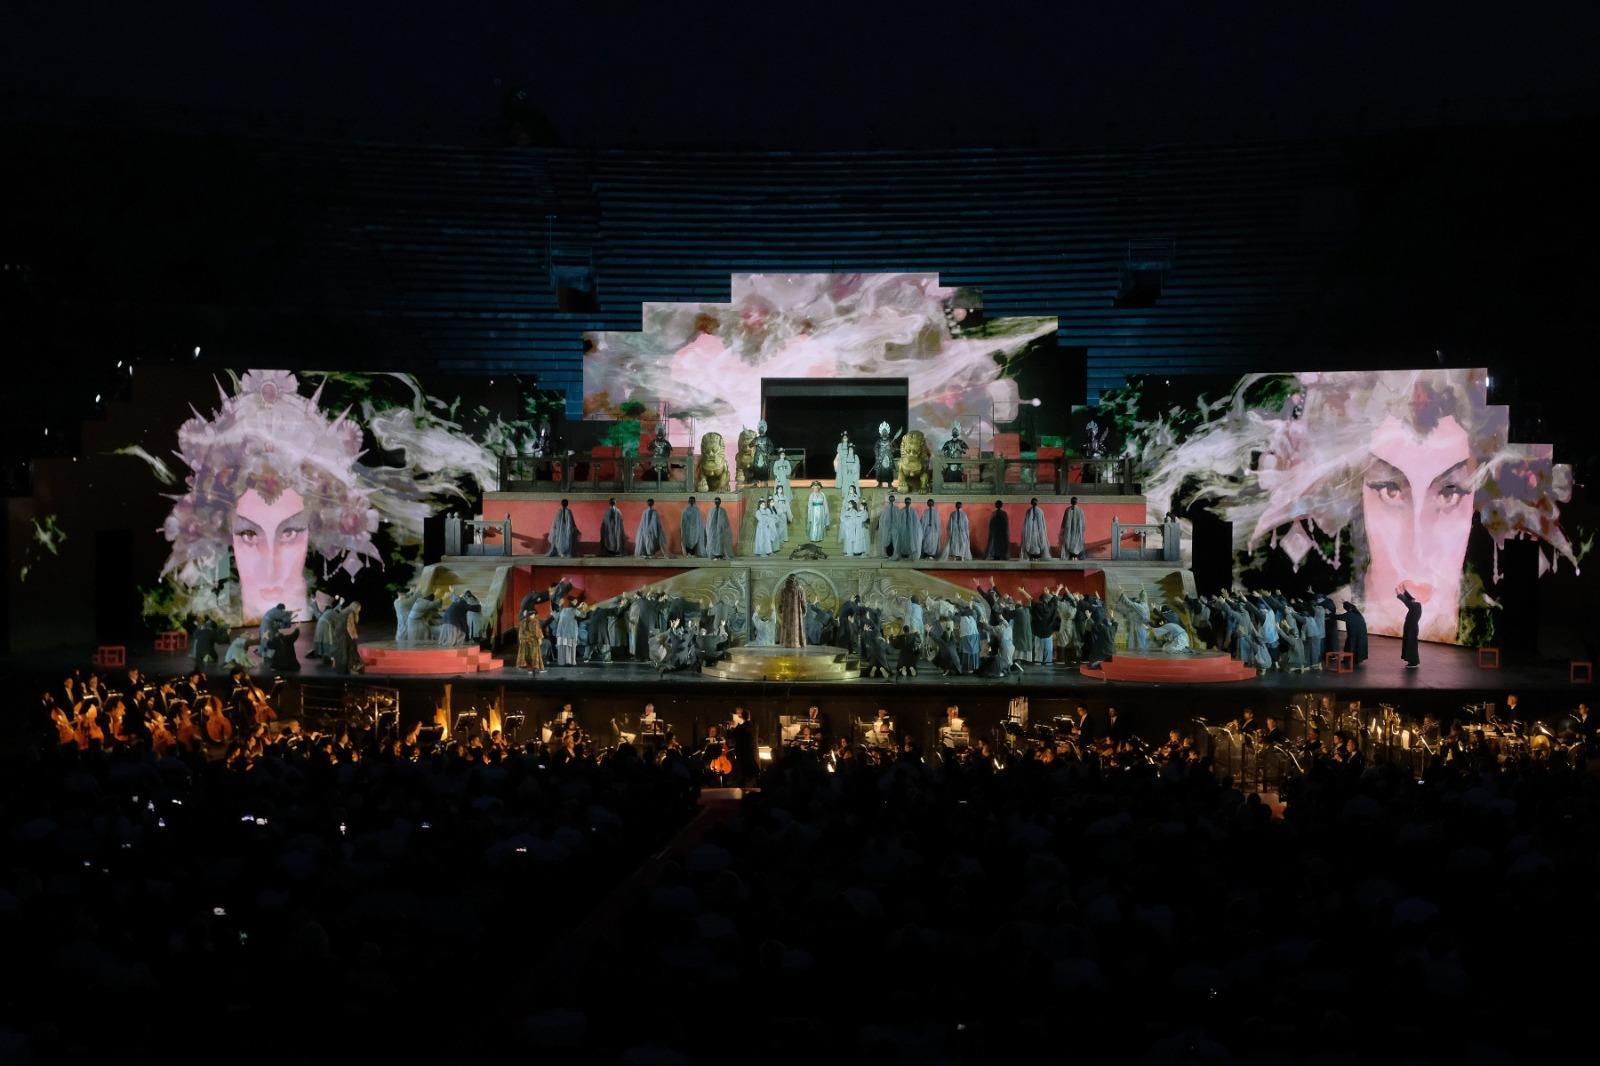 arena-di-verona-2021-turandot